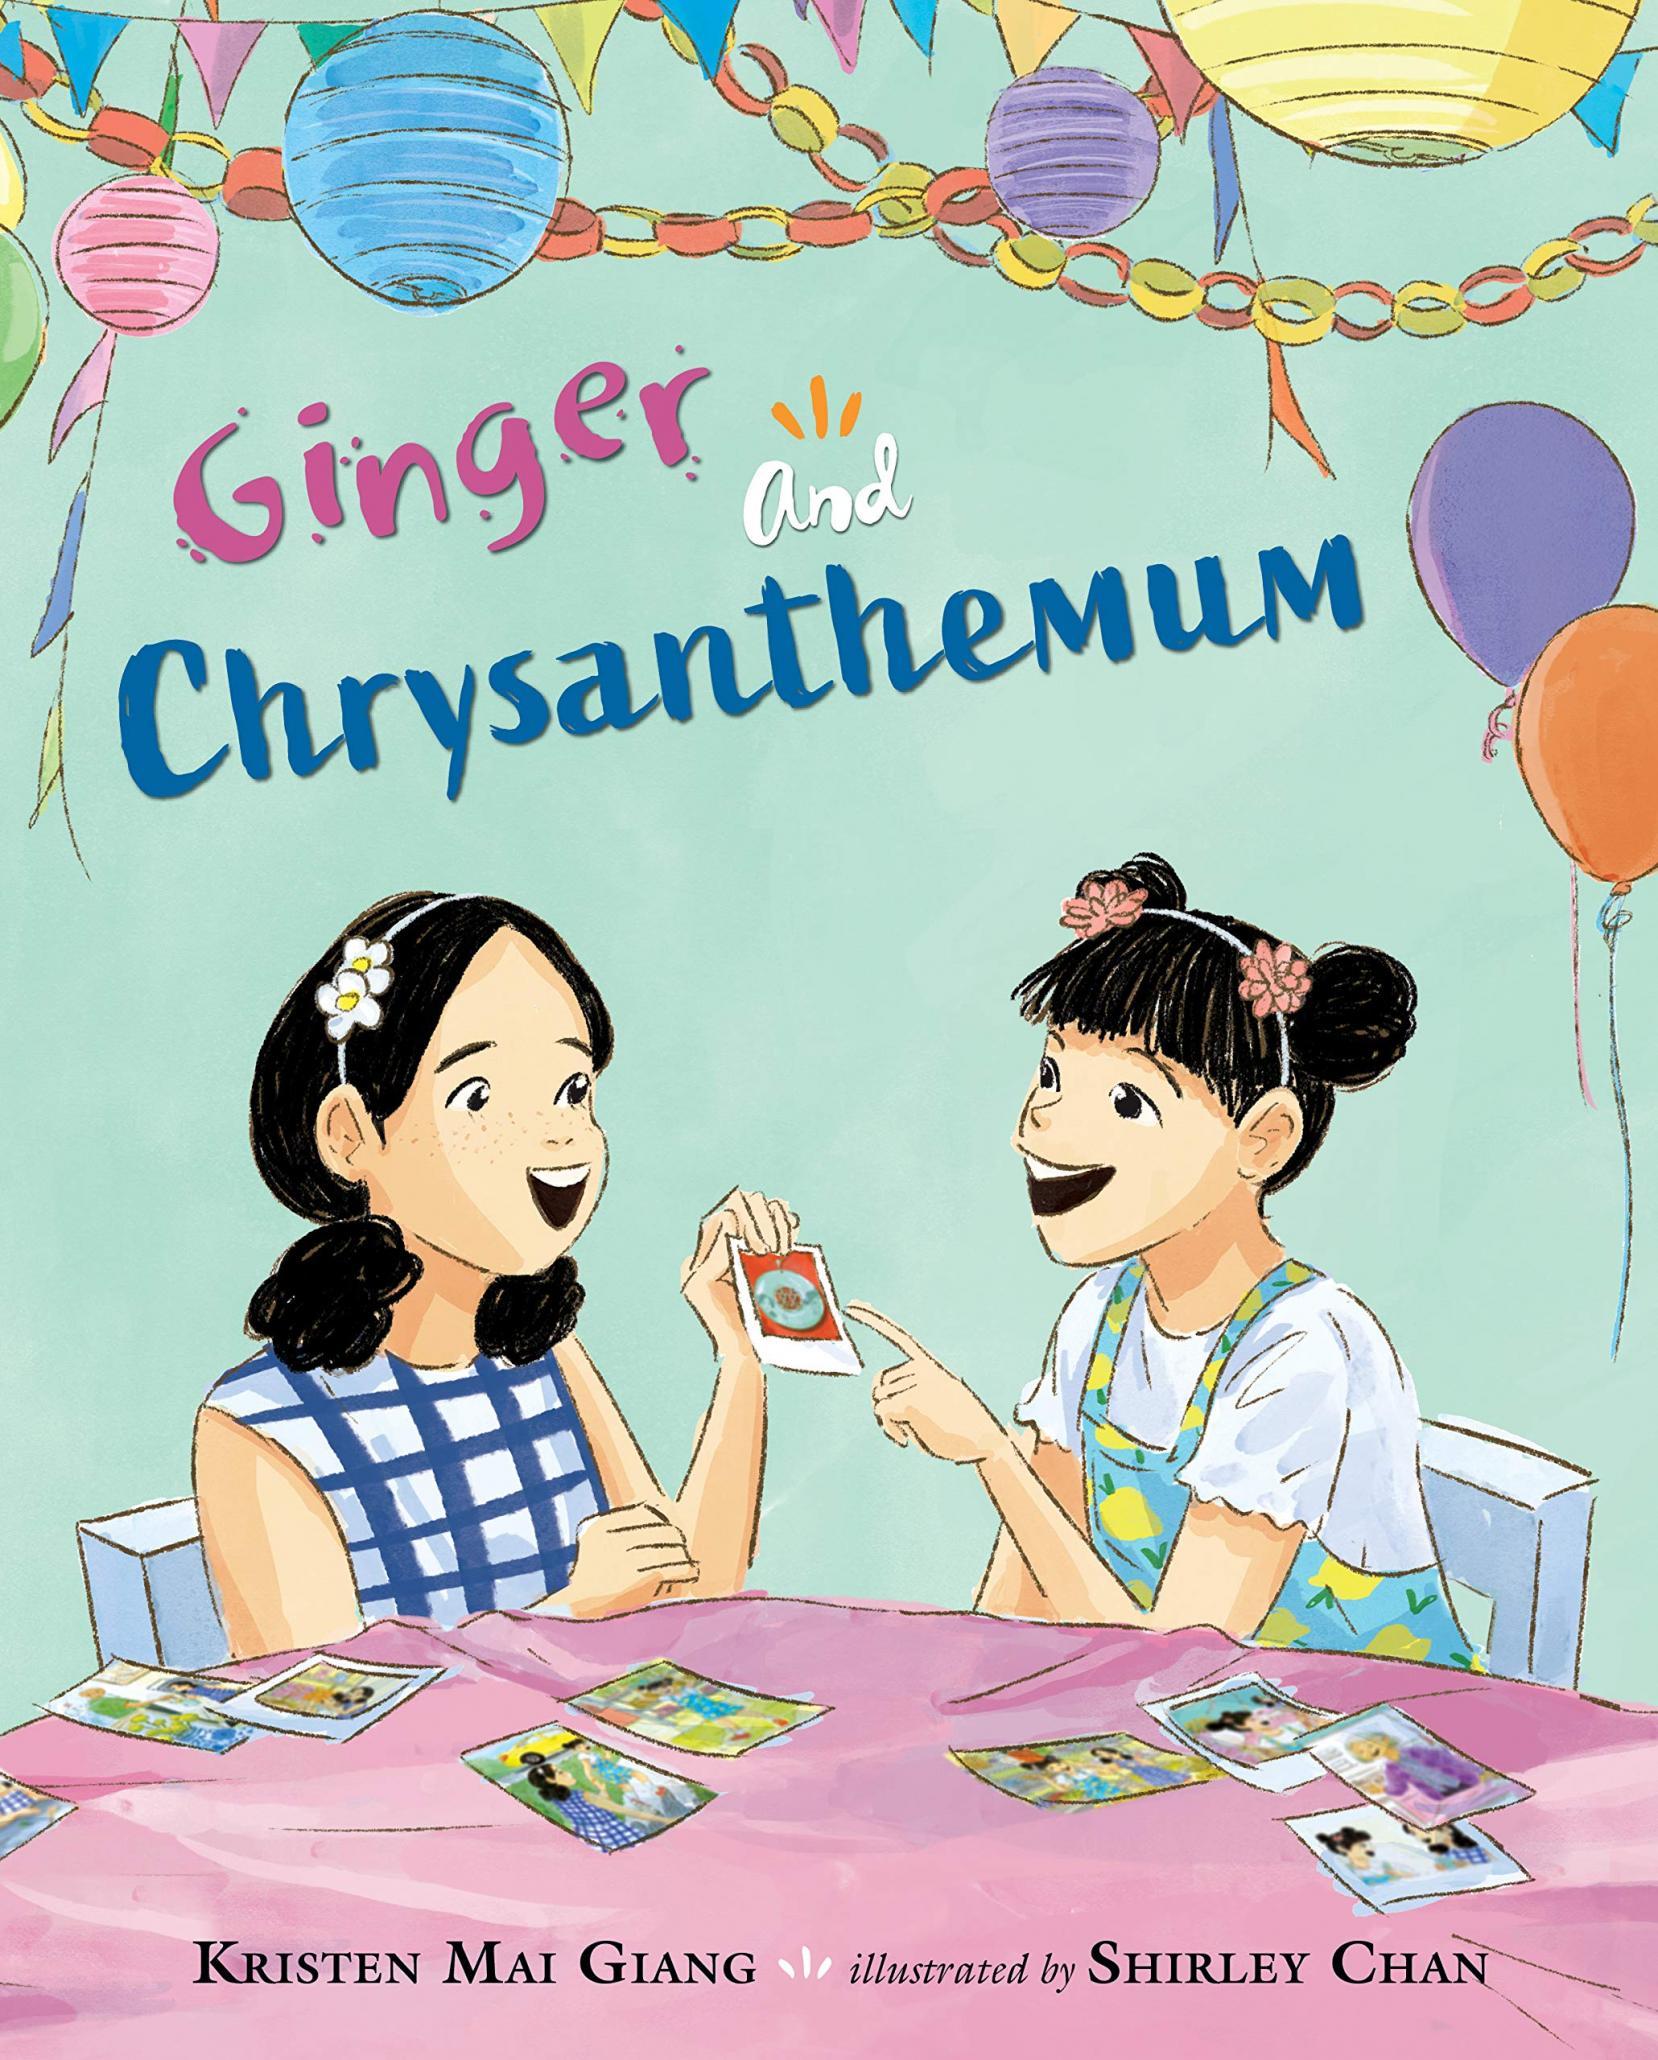 Ginger and Chrysanthemum